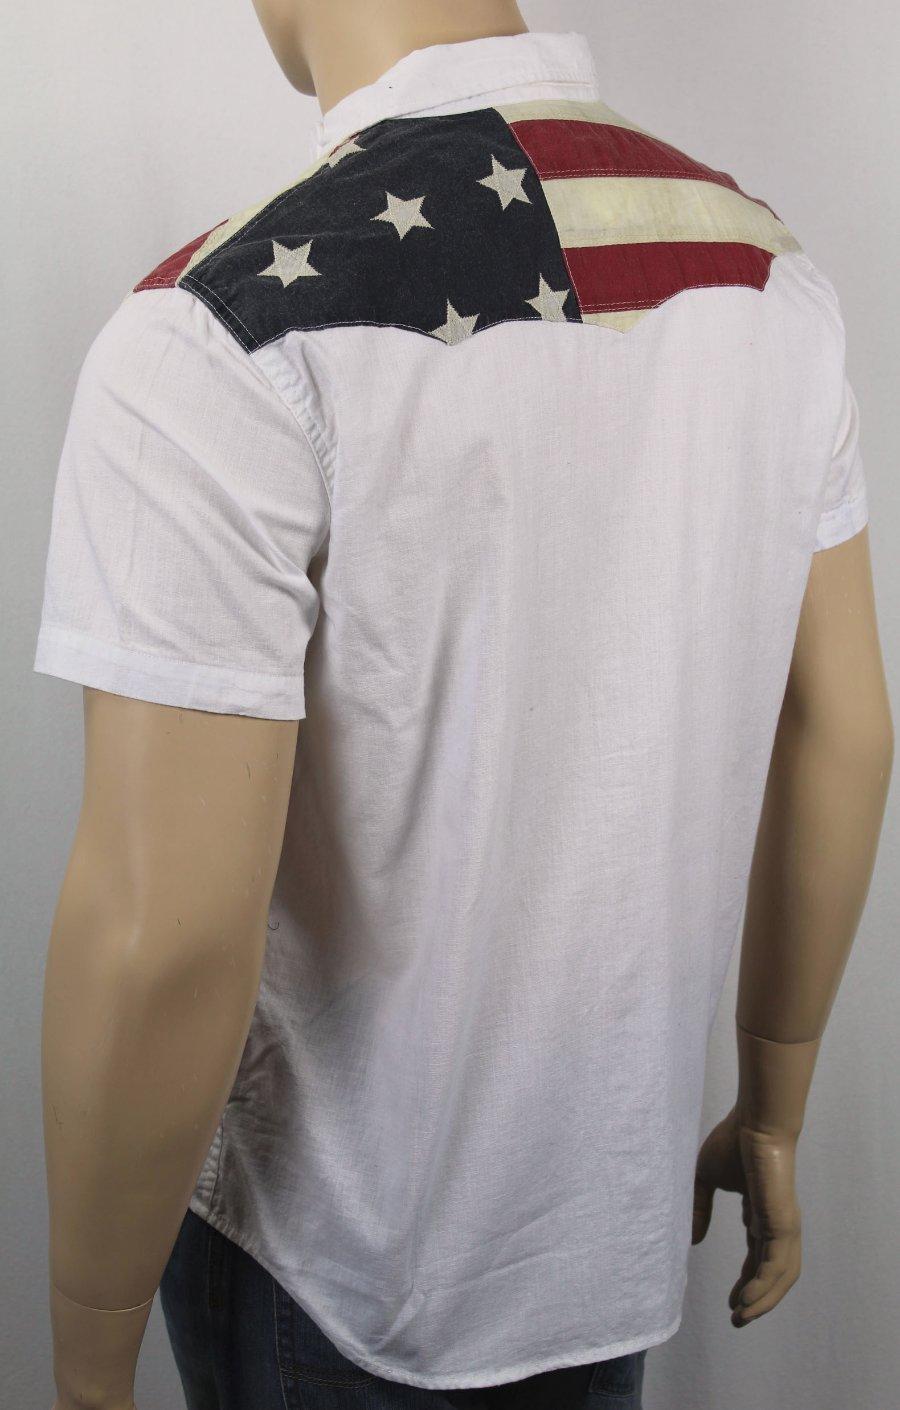 dd4798f110 Ralph Lauren Denim Supply White Patriotic American Flag Shirt Snaps ...